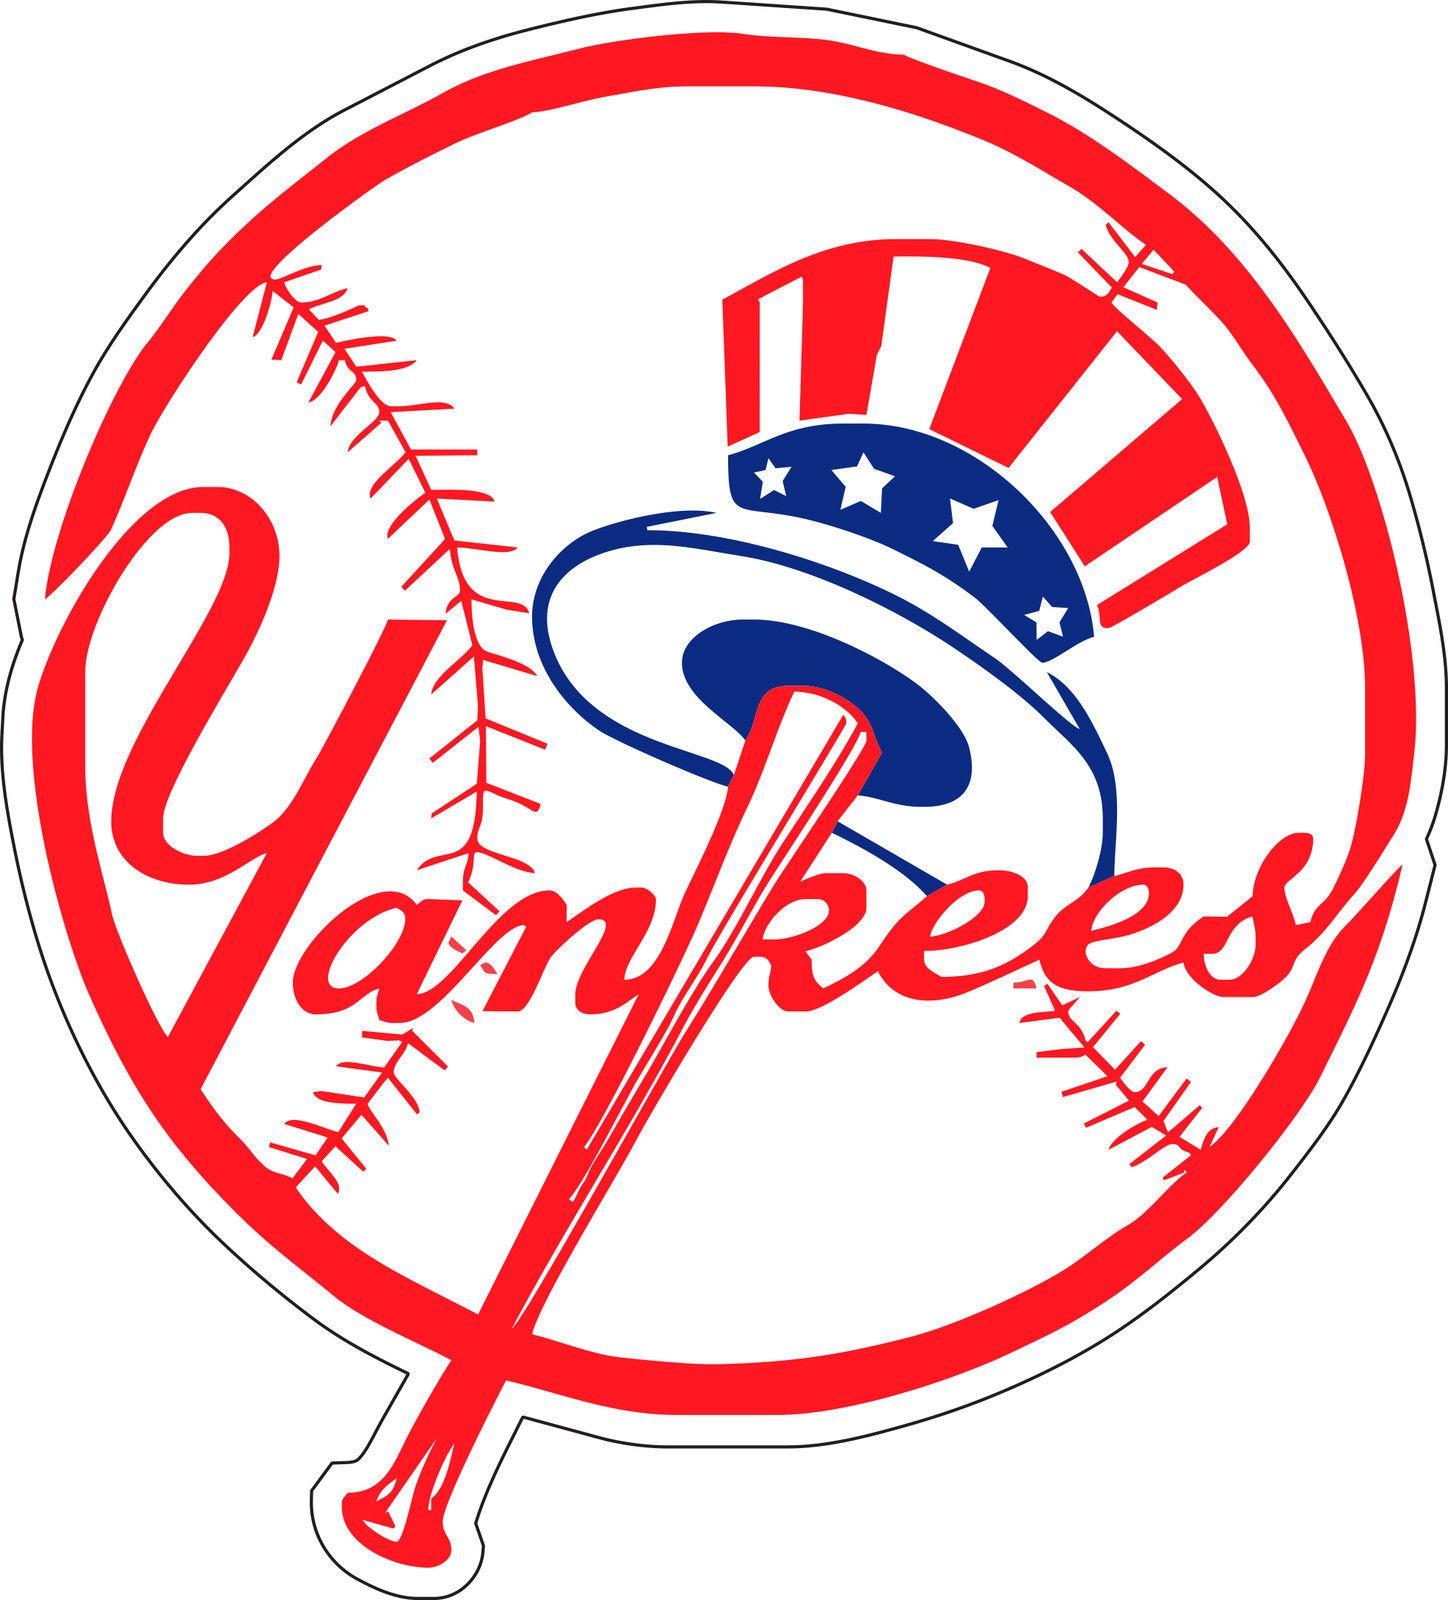 New York Yankees Mlb Baseball Bumper Sticker Wall Decor Vinyl Decal 5 X 4 5 New York Yankees Logo Yankees Baseball New York Yankees